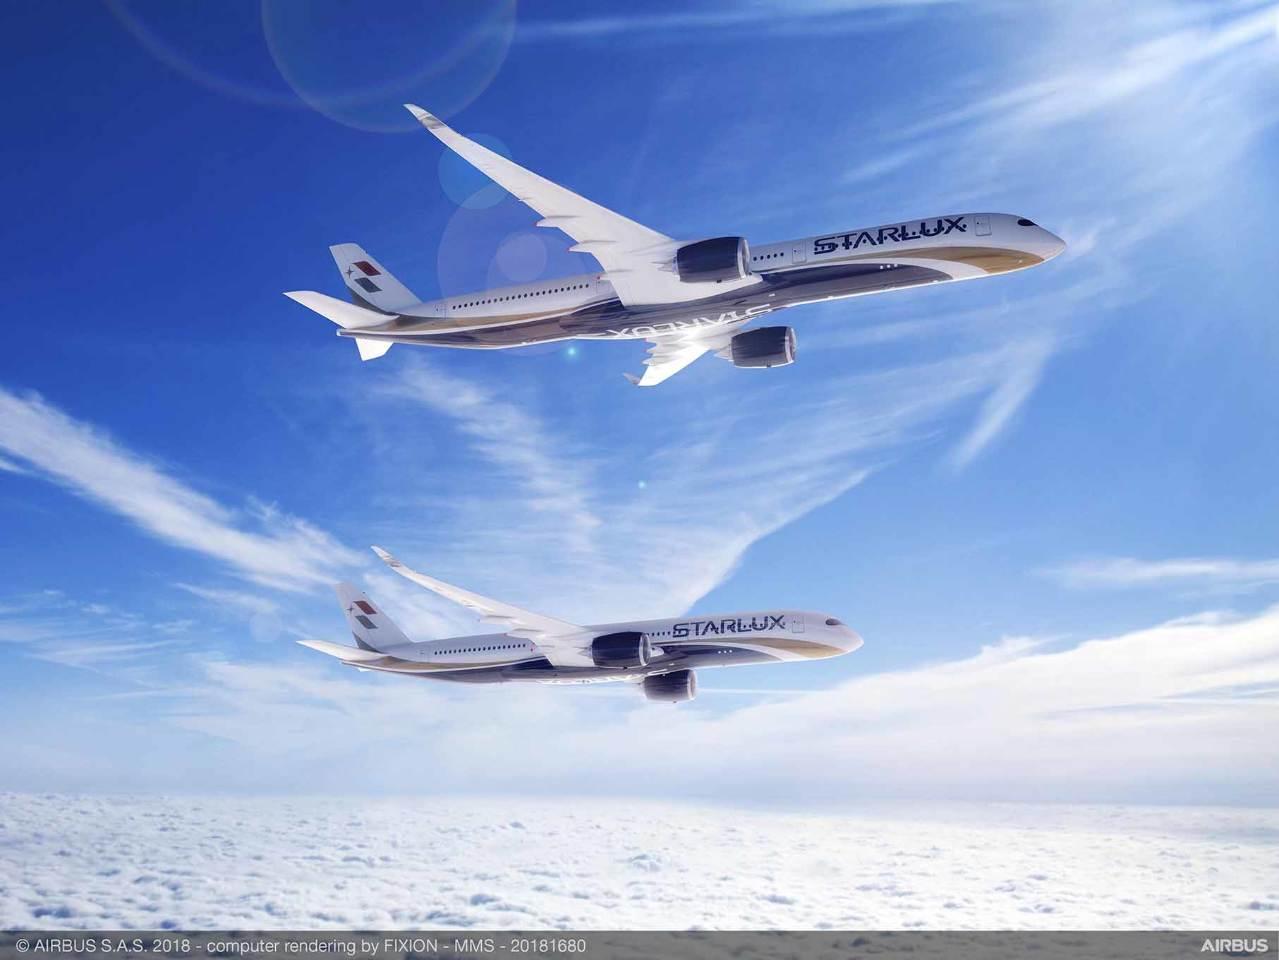 Farnborough 2018 : l'Airbus A350 XWB franchit le cap des 900 ventes